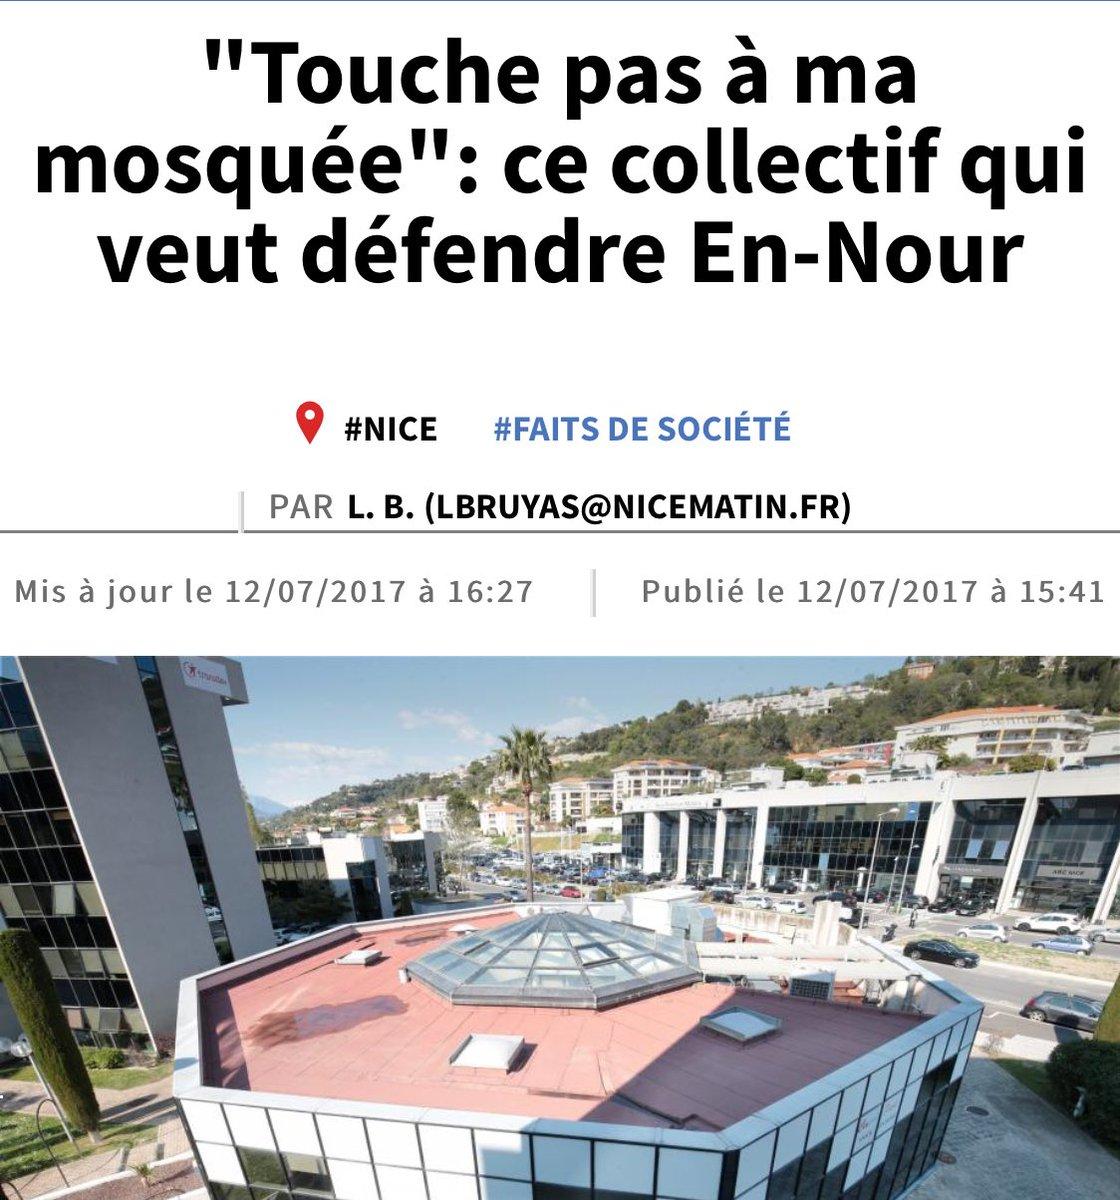 #TouchePasAMaMosquee